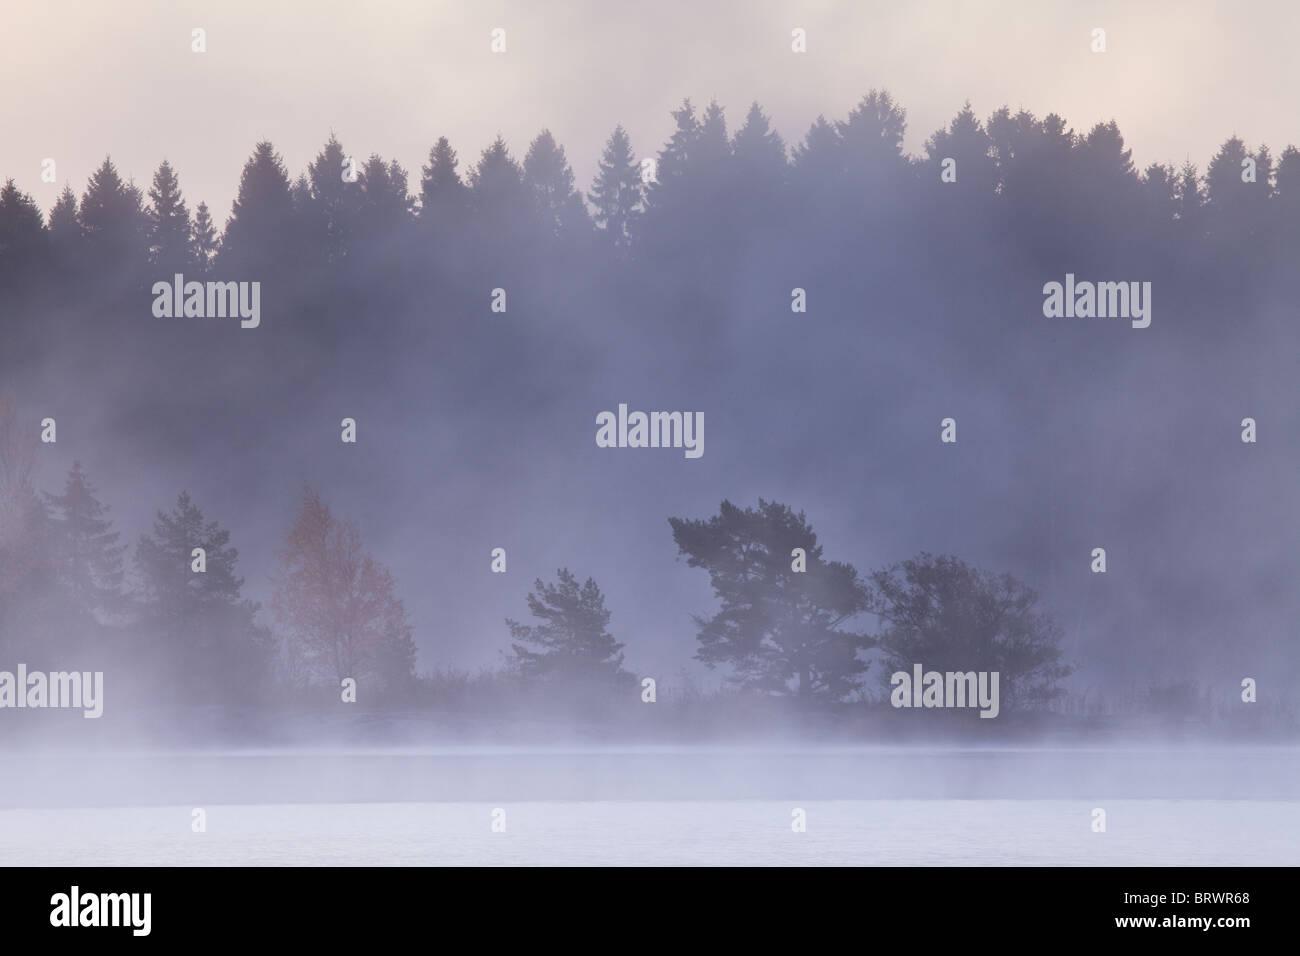 Early Morning mist dopo una notte gelida nel lago Vansjø, Østfold fylke, Norvegia. Immagini Stock